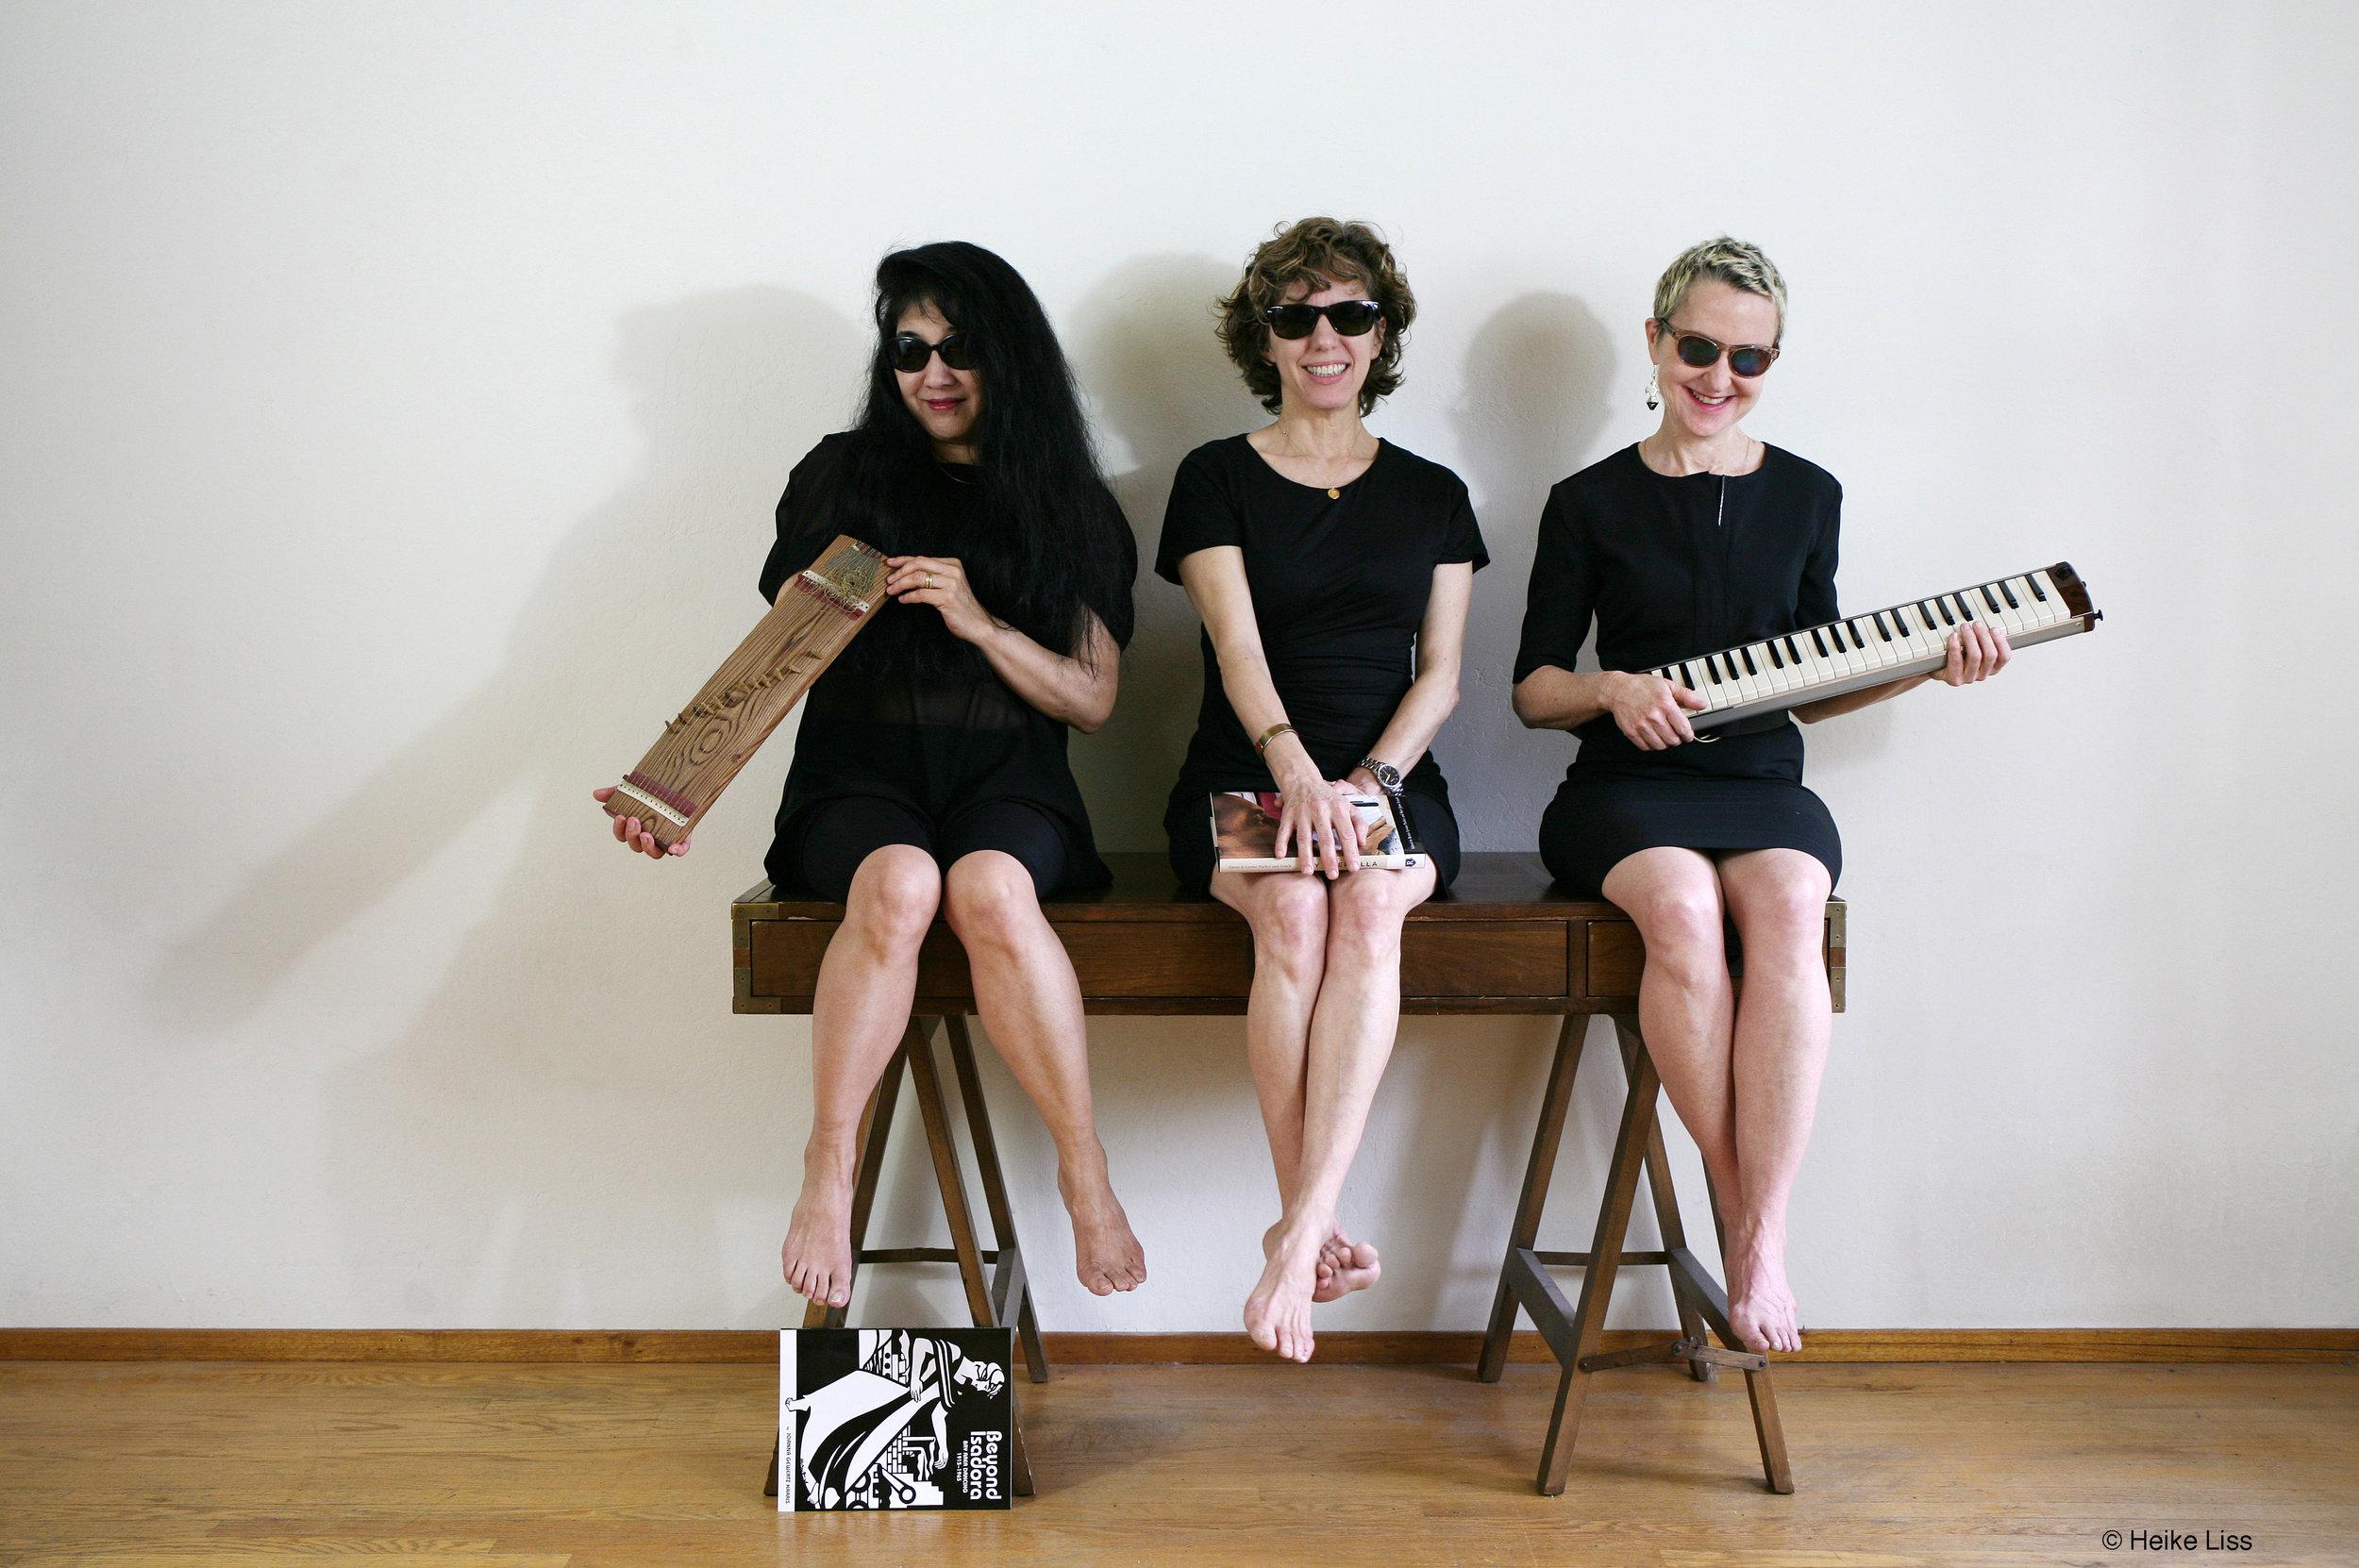 MZM: Miya Mazaoka, Zeena Parkins, Myra Melford © Heike Liss,